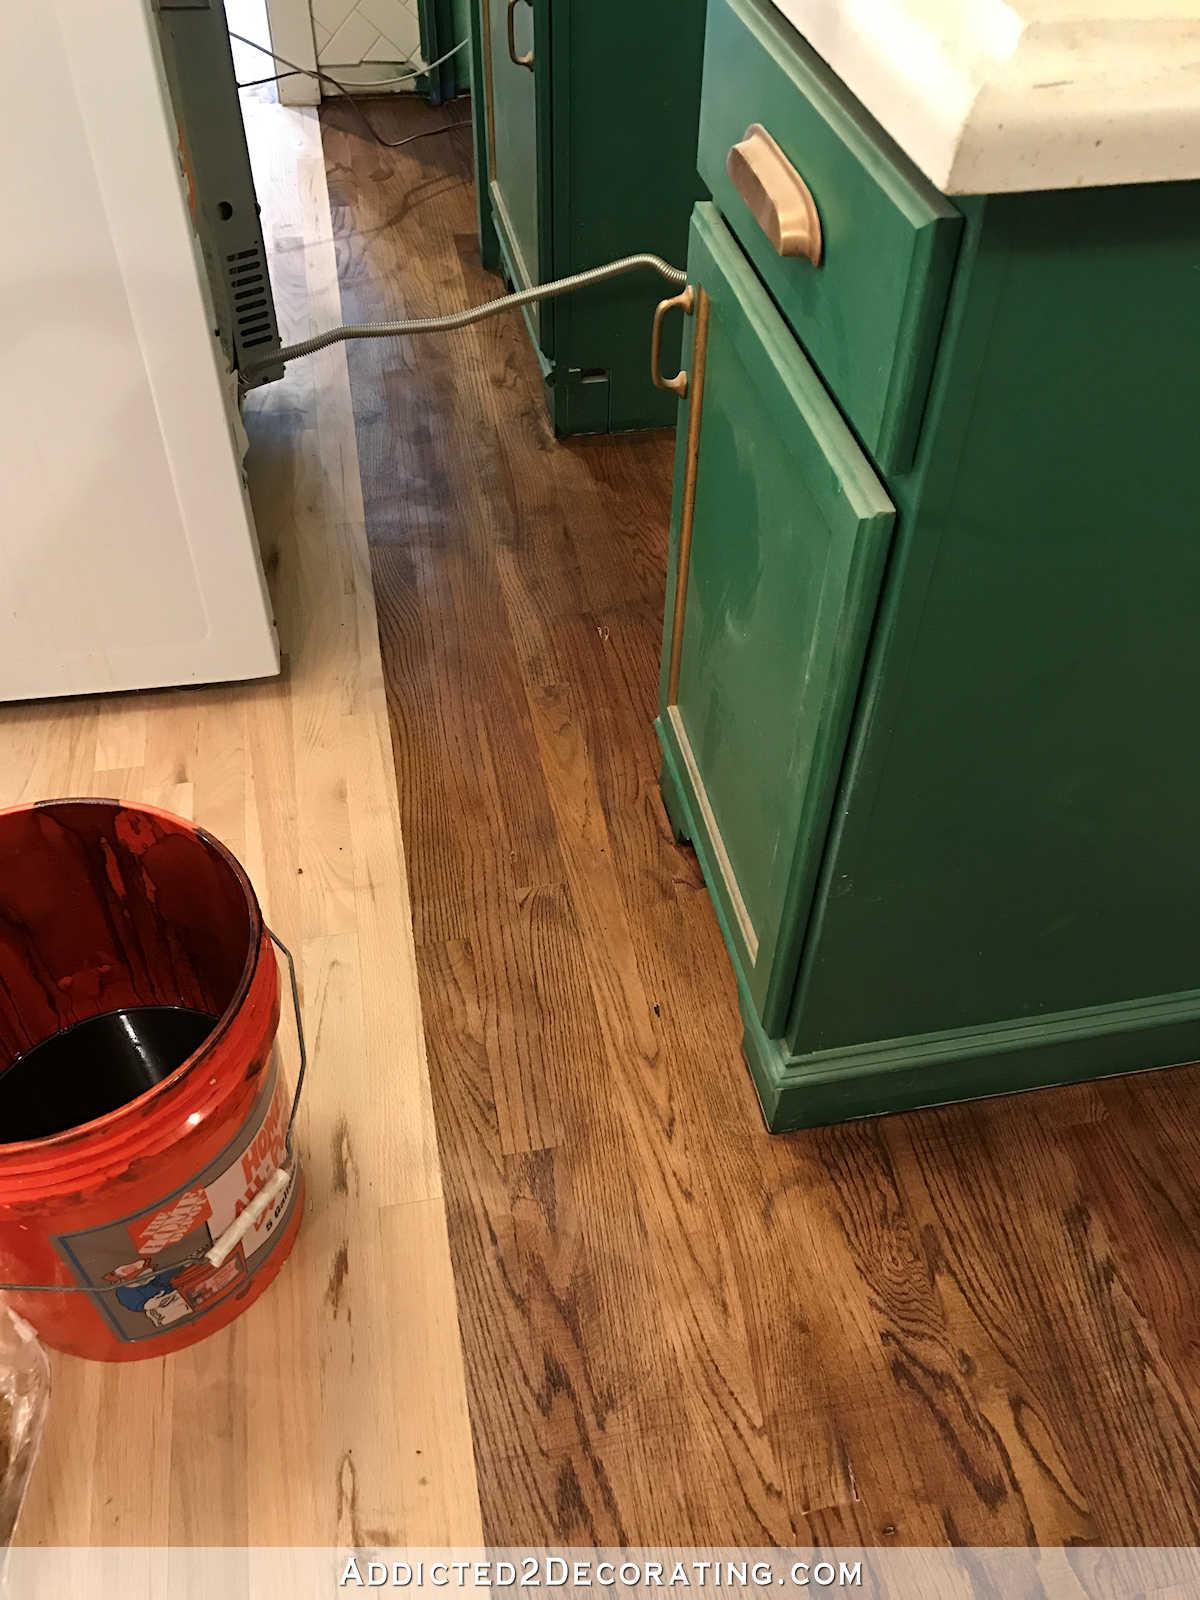 hardwood floor refinishing process of adventures in staining my red oak hardwood floors products process in staining red oak hardwood floors 10 stain on kitchen floor behind stove and refrigerator